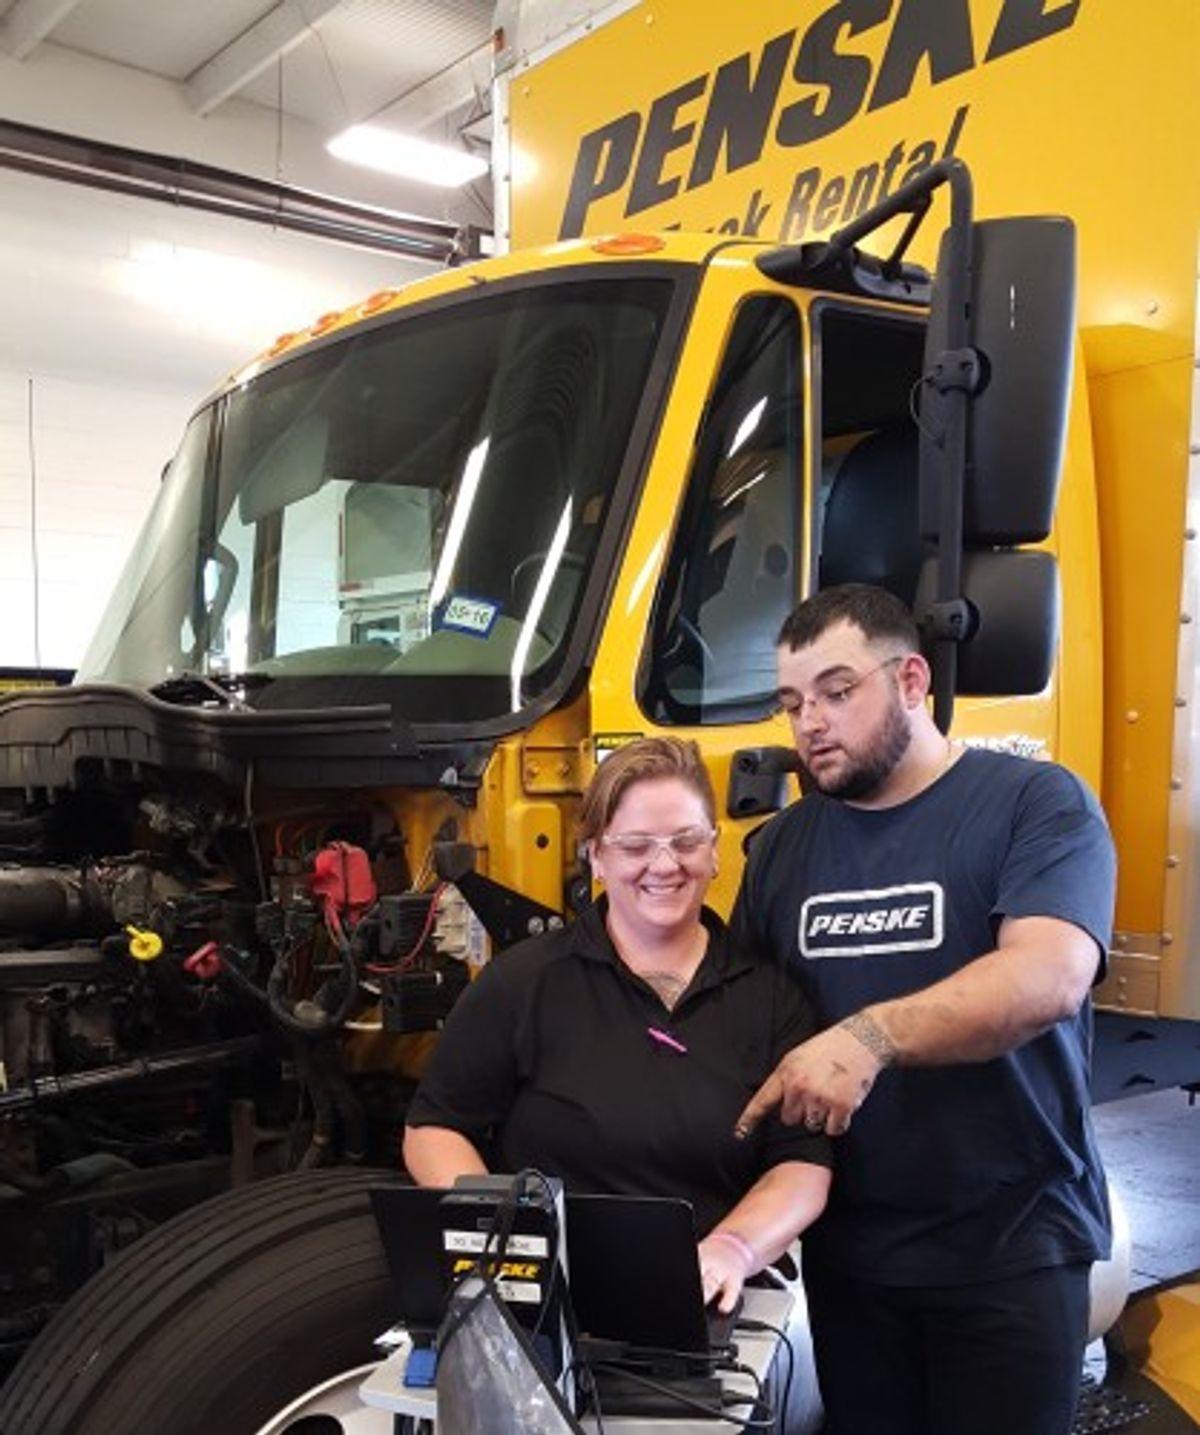 Veteran Shines in Maintenance Role